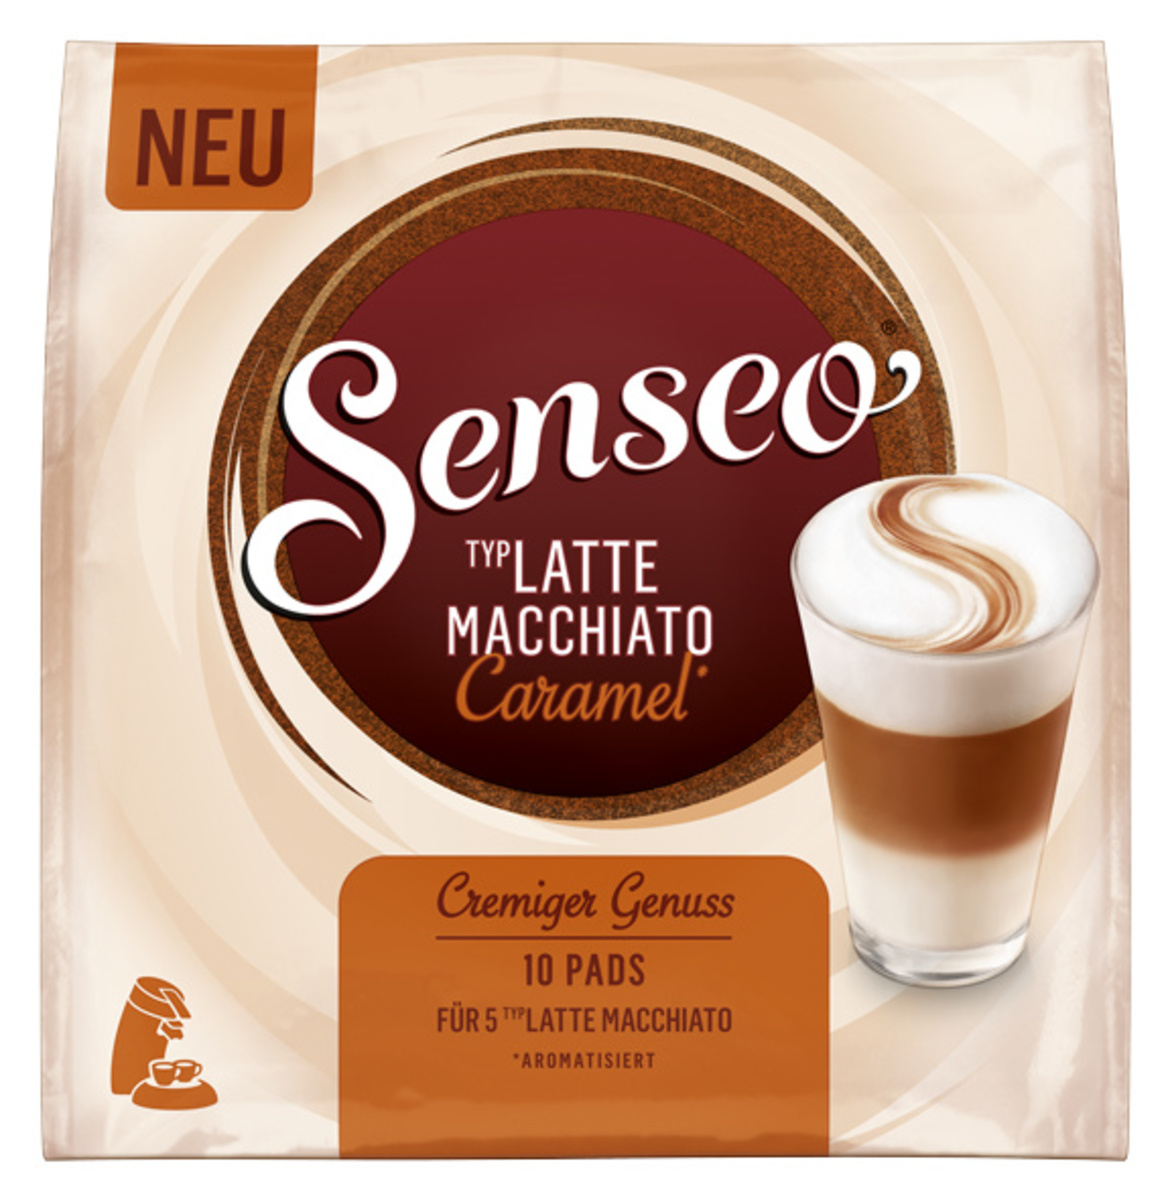 Bild 1 von Senseo Typ Latte Macchiato Caramel | 10 Pads für 5 Latte Macchiato